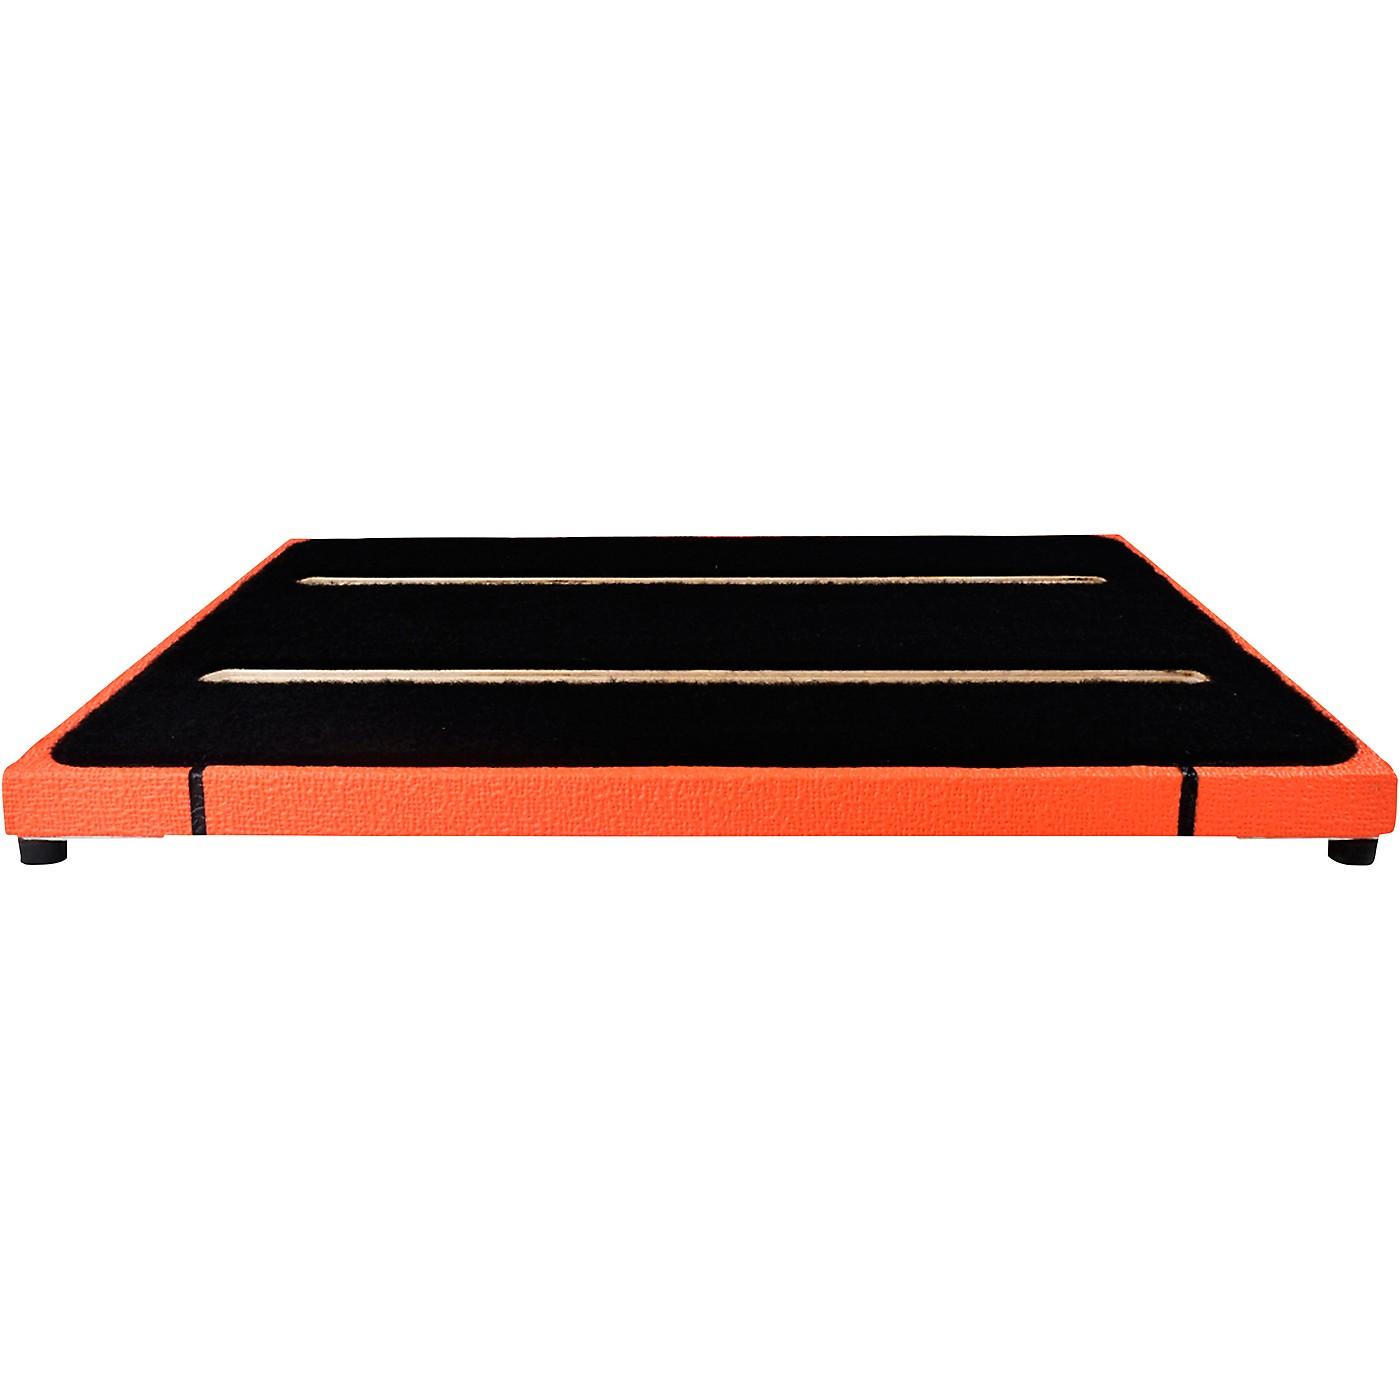 Ruach Music Orange Tolex 2.5 Pedalboard thumbnail